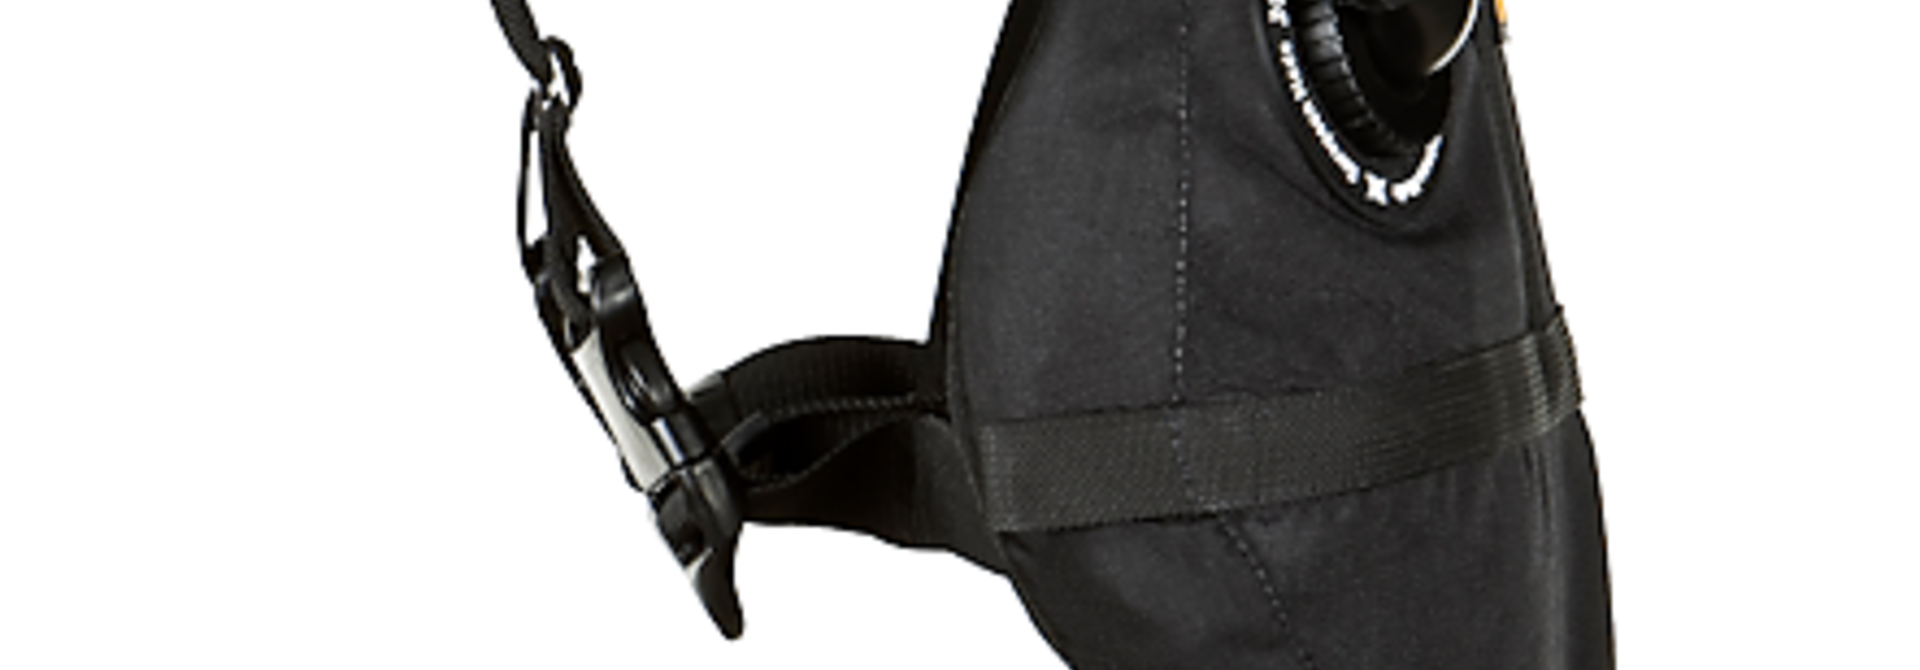 Stealth 2.0 Sidemount wing REC